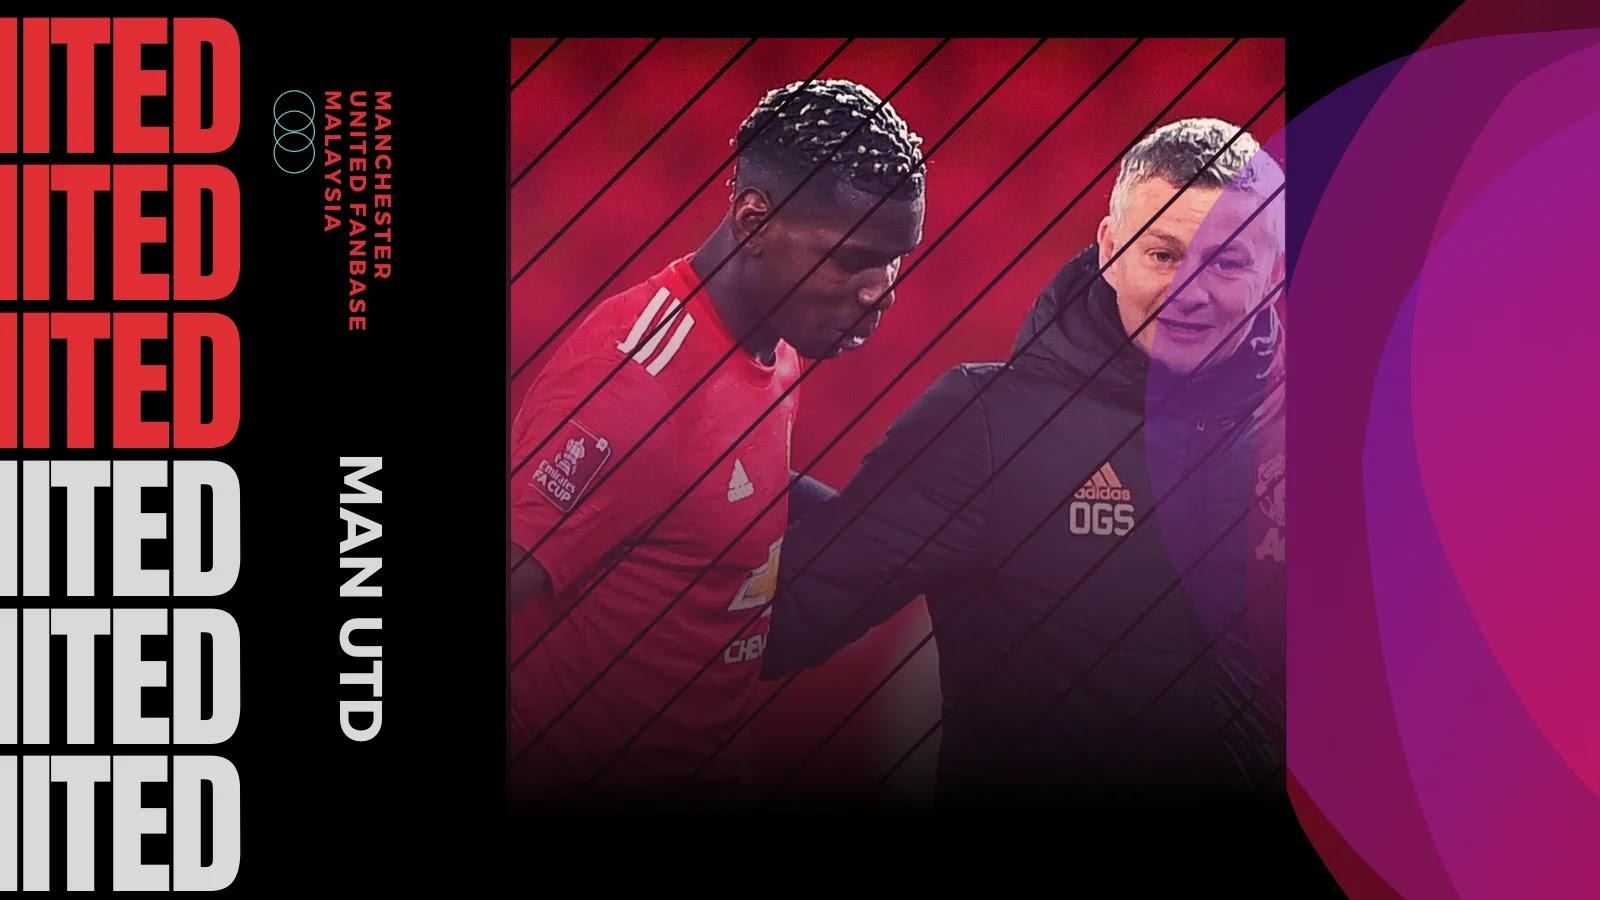 5 Sebab Pogba Bukan Lagi Masalah Bagi Man United